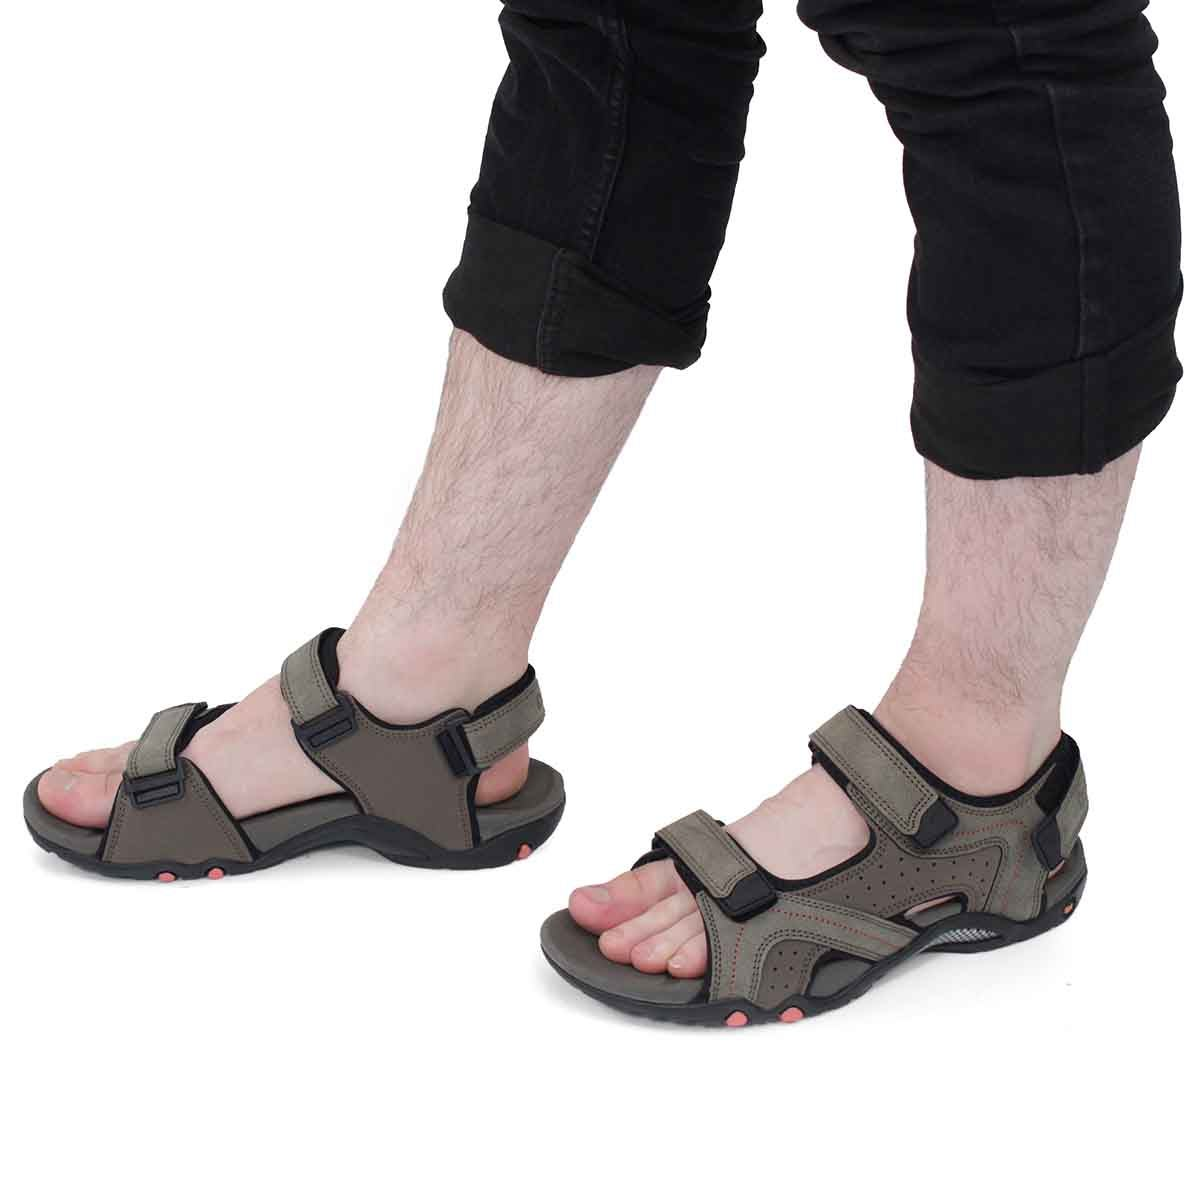 Mns Kraznys taupe 3 strap sport sandal